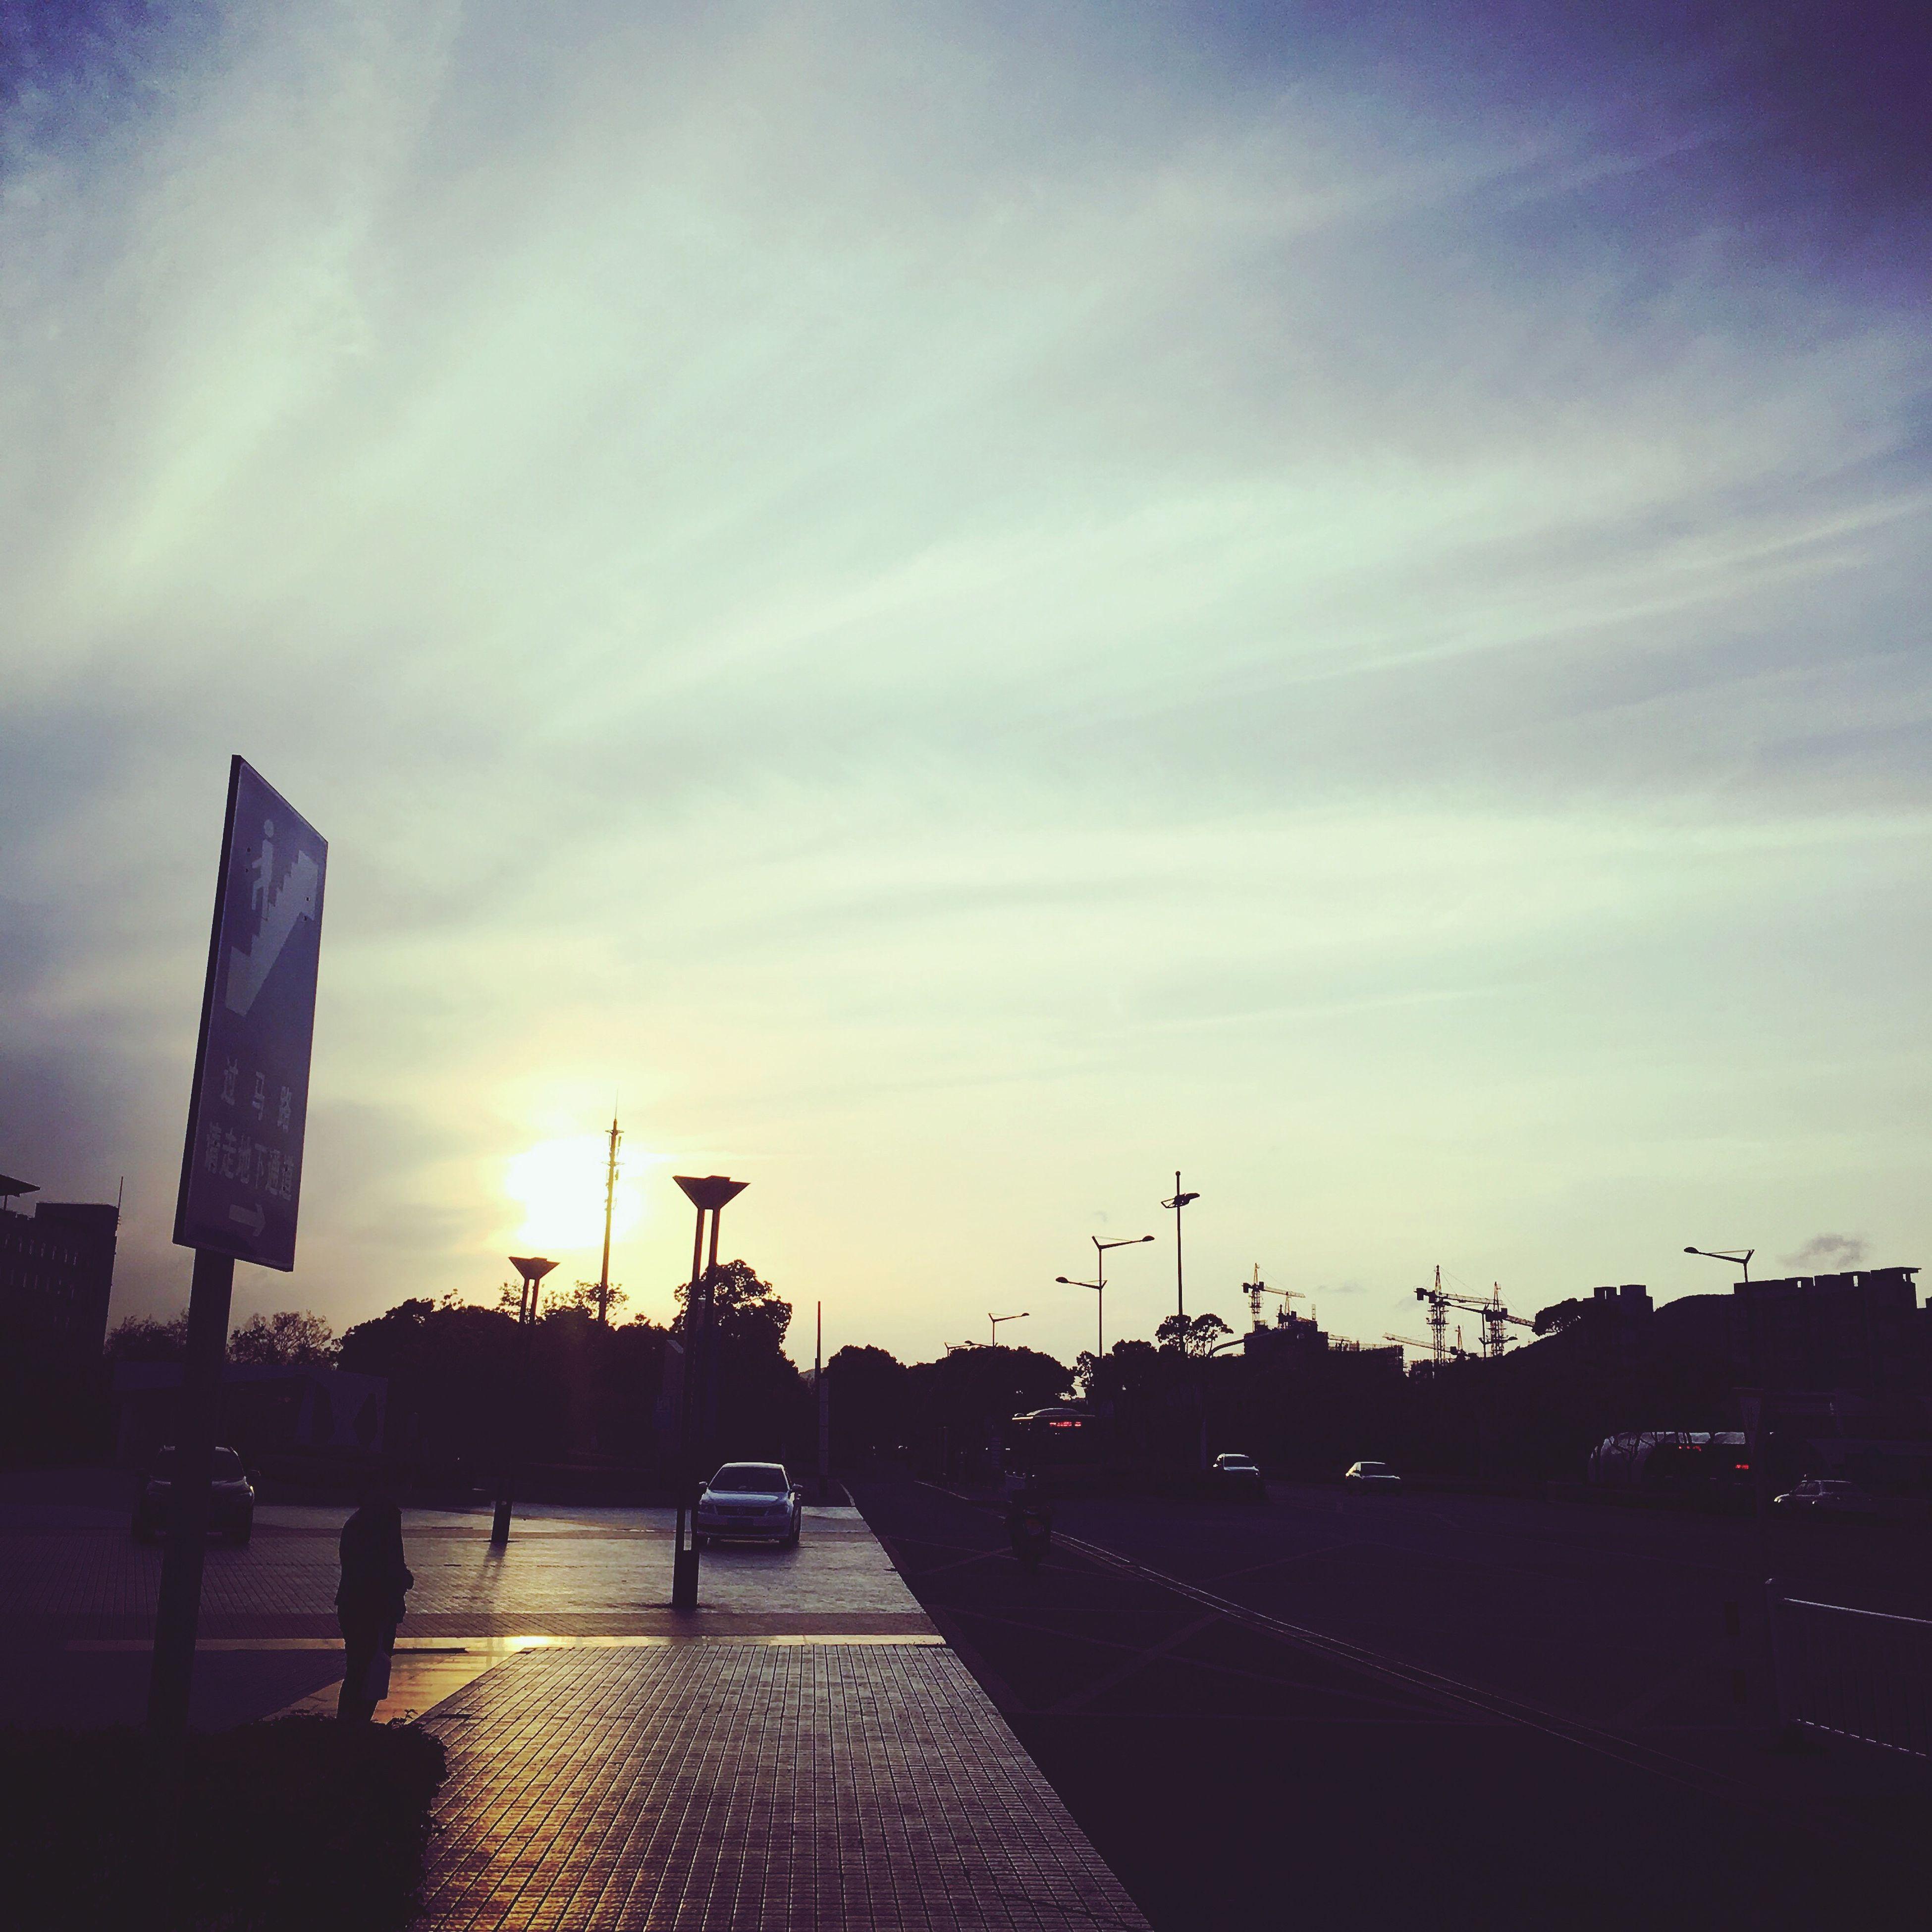 sky, sunset, built structure, architecture, building exterior, silhouette, cloud - sky, city, cloud, sunlight, transportation, road, cloudy, outdoors, dusk, street, no people, orange color, the way forward, nature